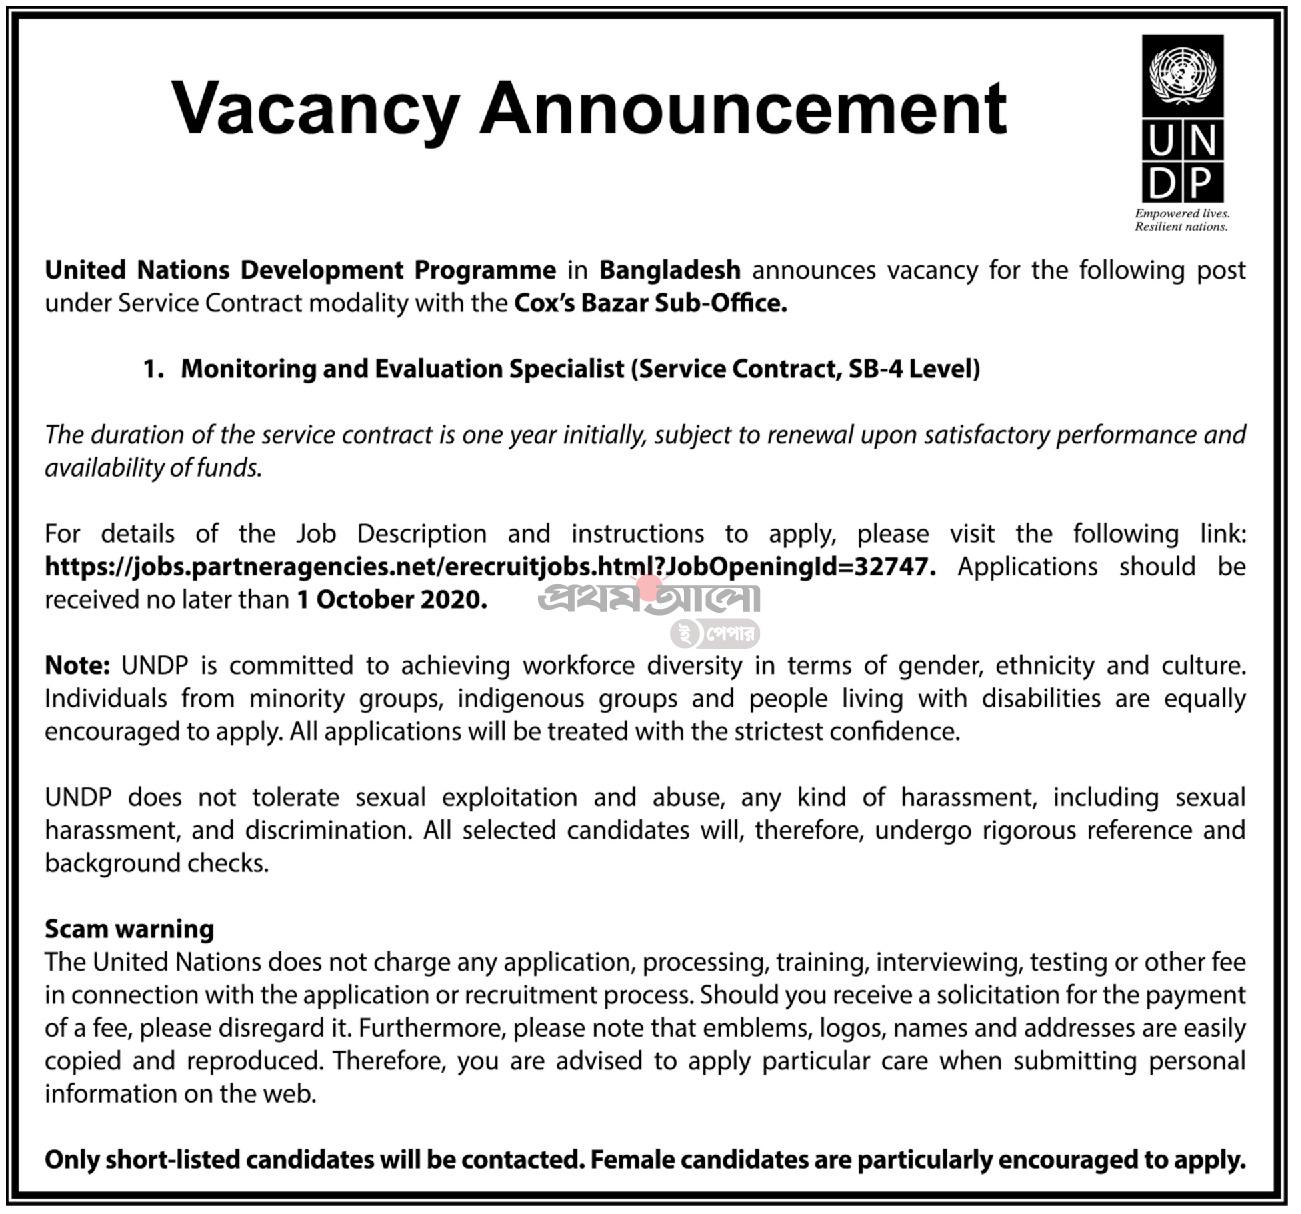 UNDP NGO JOB VACANCY